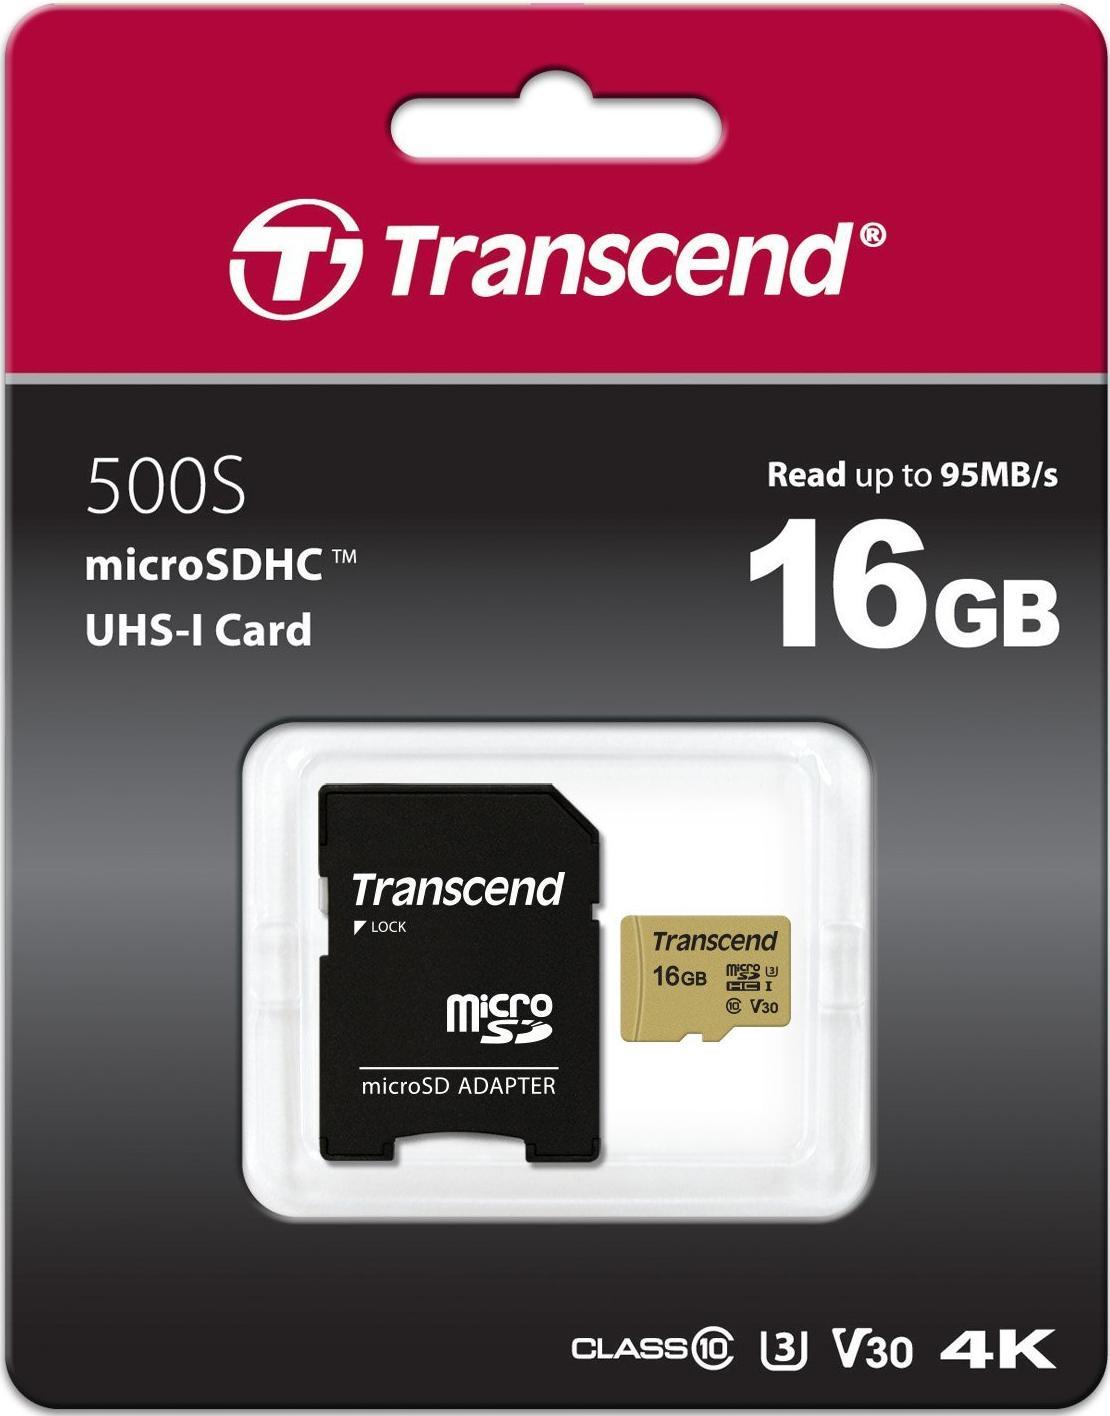 Купить Flash пам'ять, Карта пам'яті Transcend 500S V30 Micro SDHC 16GB TS16GUSD500S